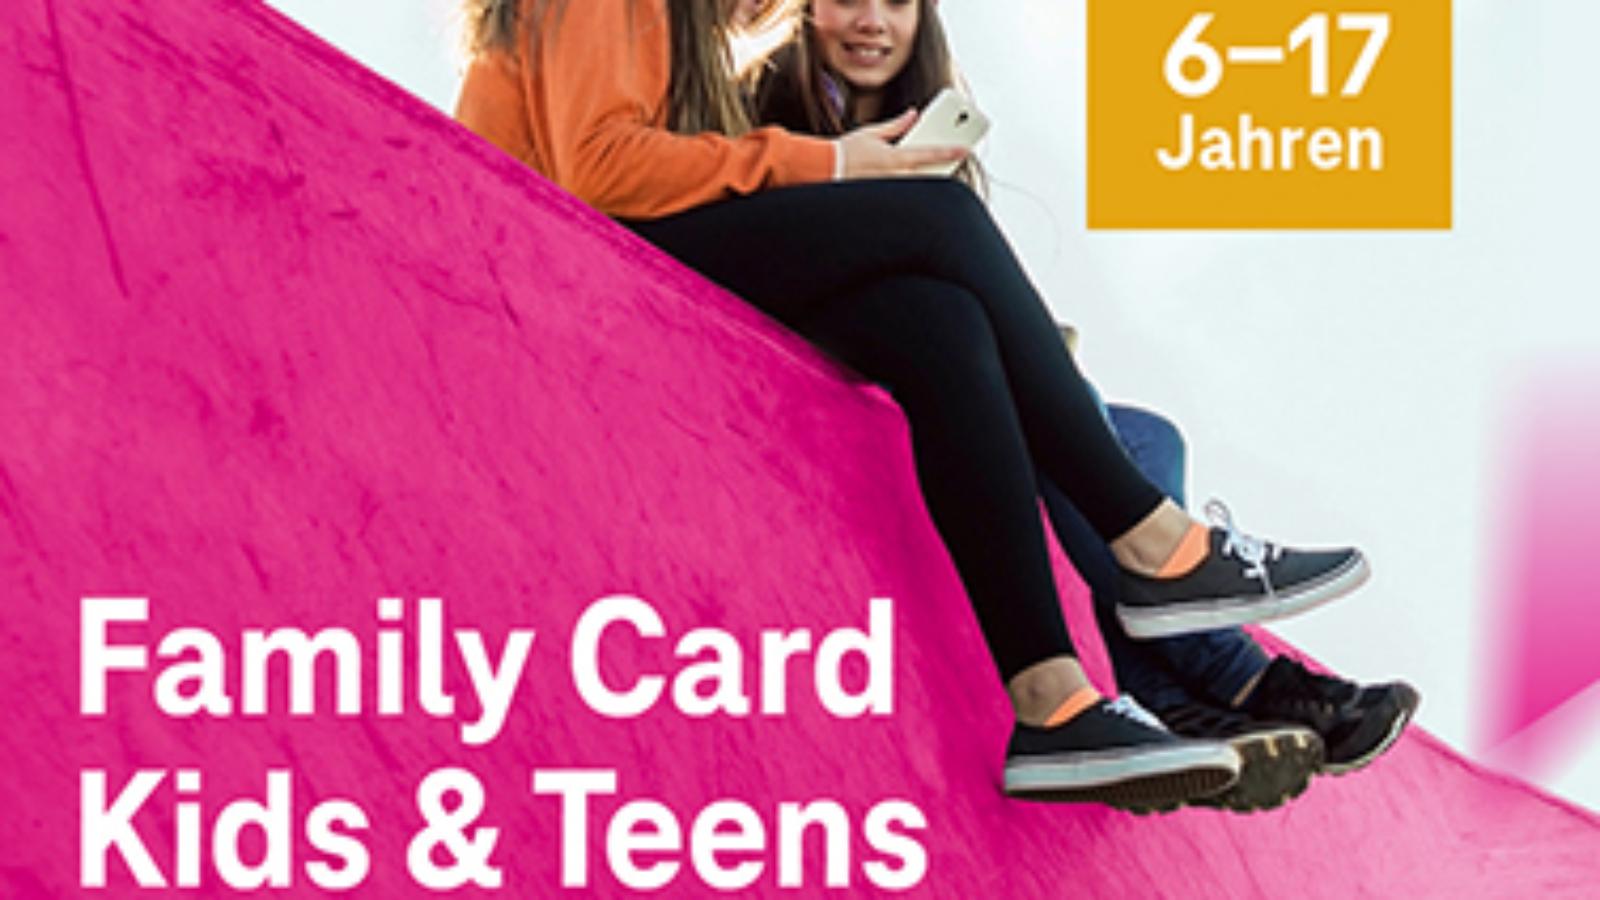 Telekom_FamilyCard_Kids